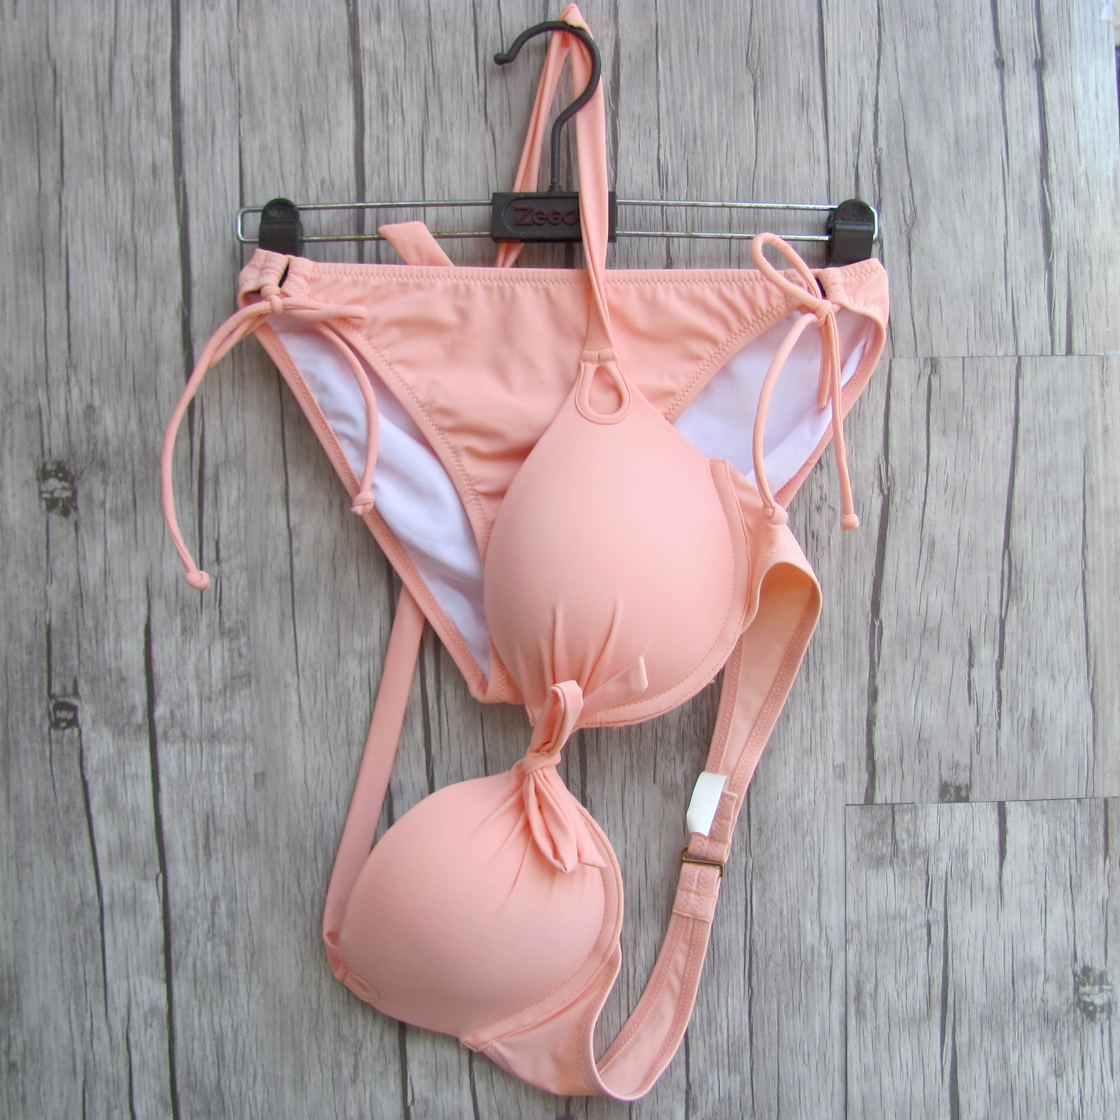 Women Bikini Orange Bathing suits Sexy biqini UNDERWIRE Maillot de bain Low Waist Designs Secret Swimwear bikinis<br><br>Aliexpress